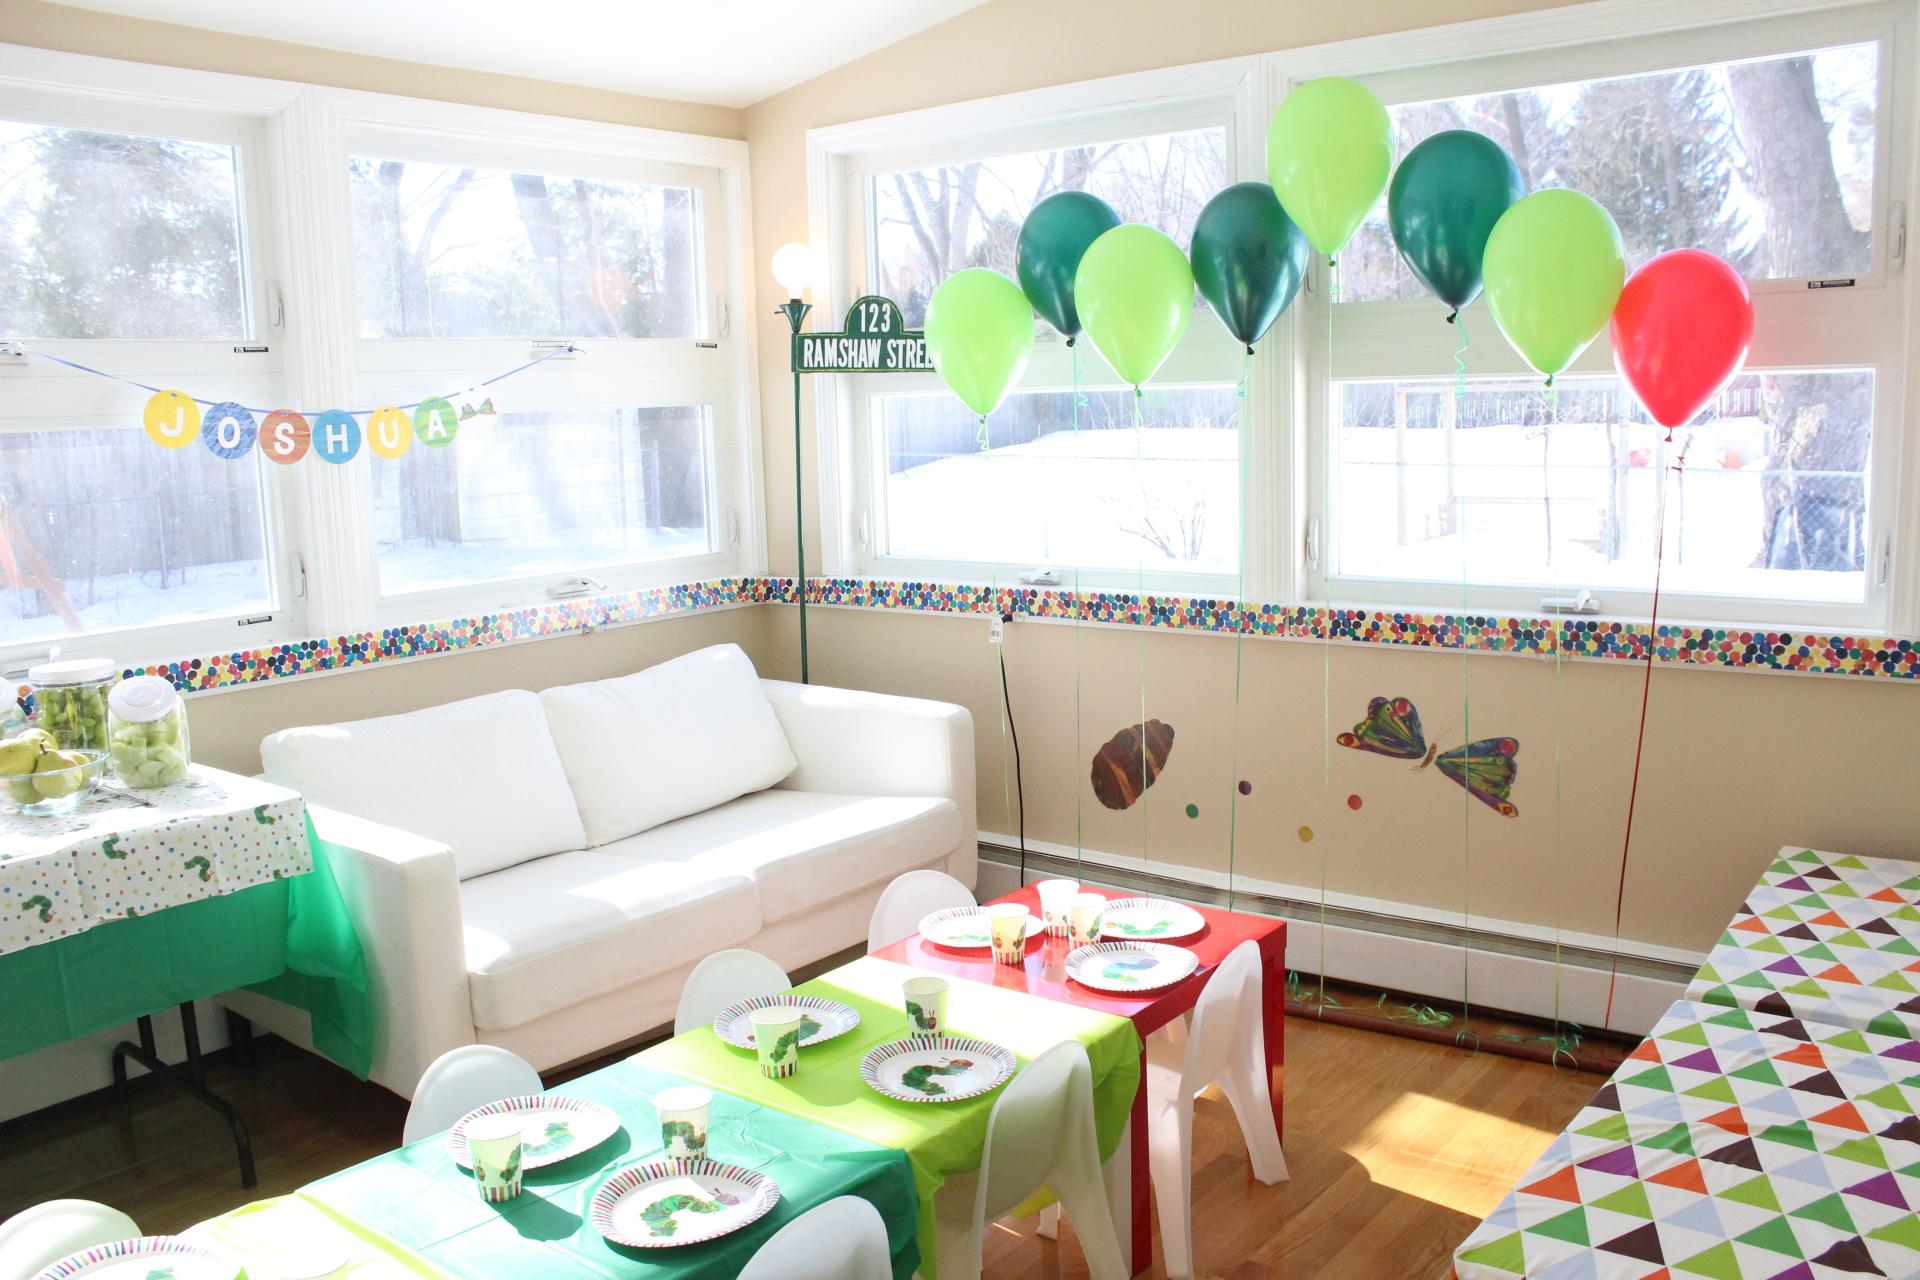 Book-Themed Birthdays